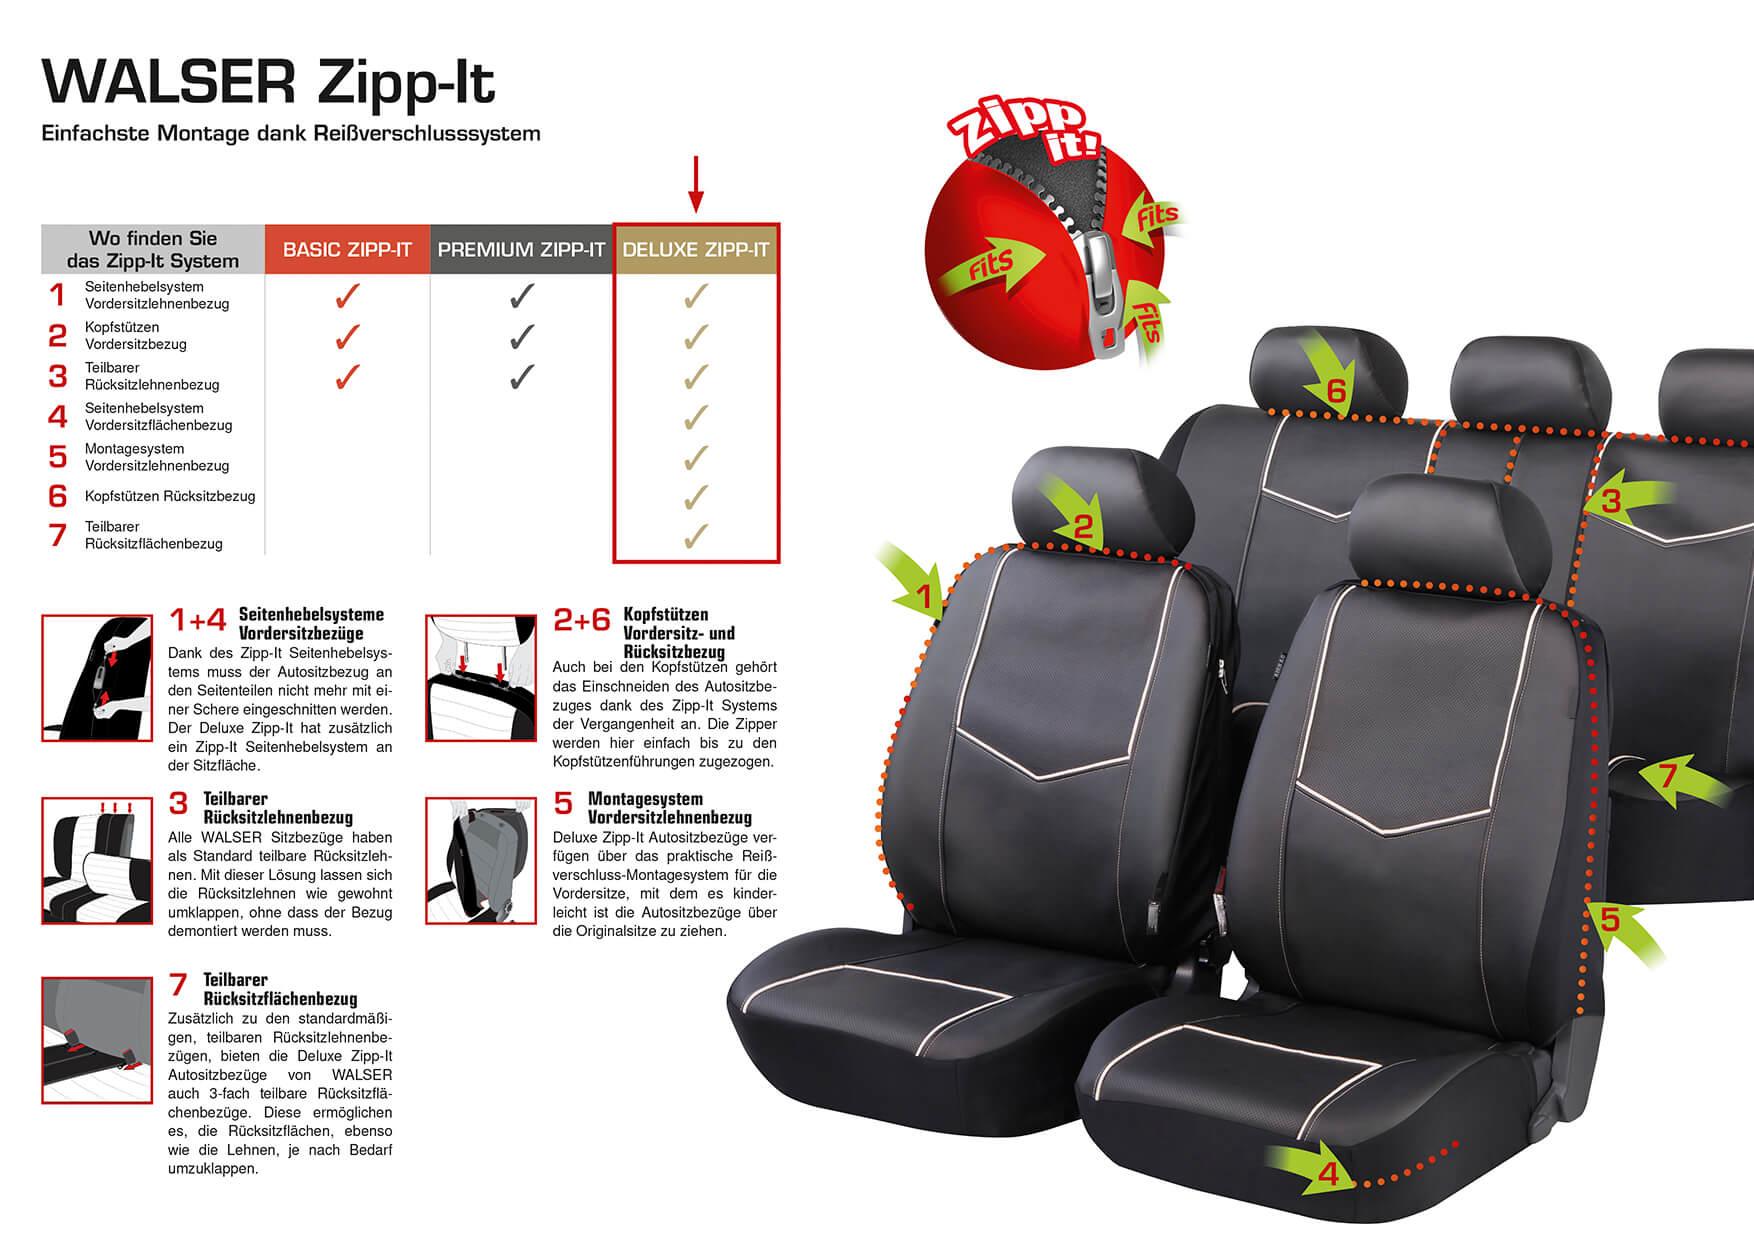 Walser Zipp IT Deluxe Paddington Auto Sitzbez/üge aus Kunstleder f/ür Vordersitze mit Reissverschluss System